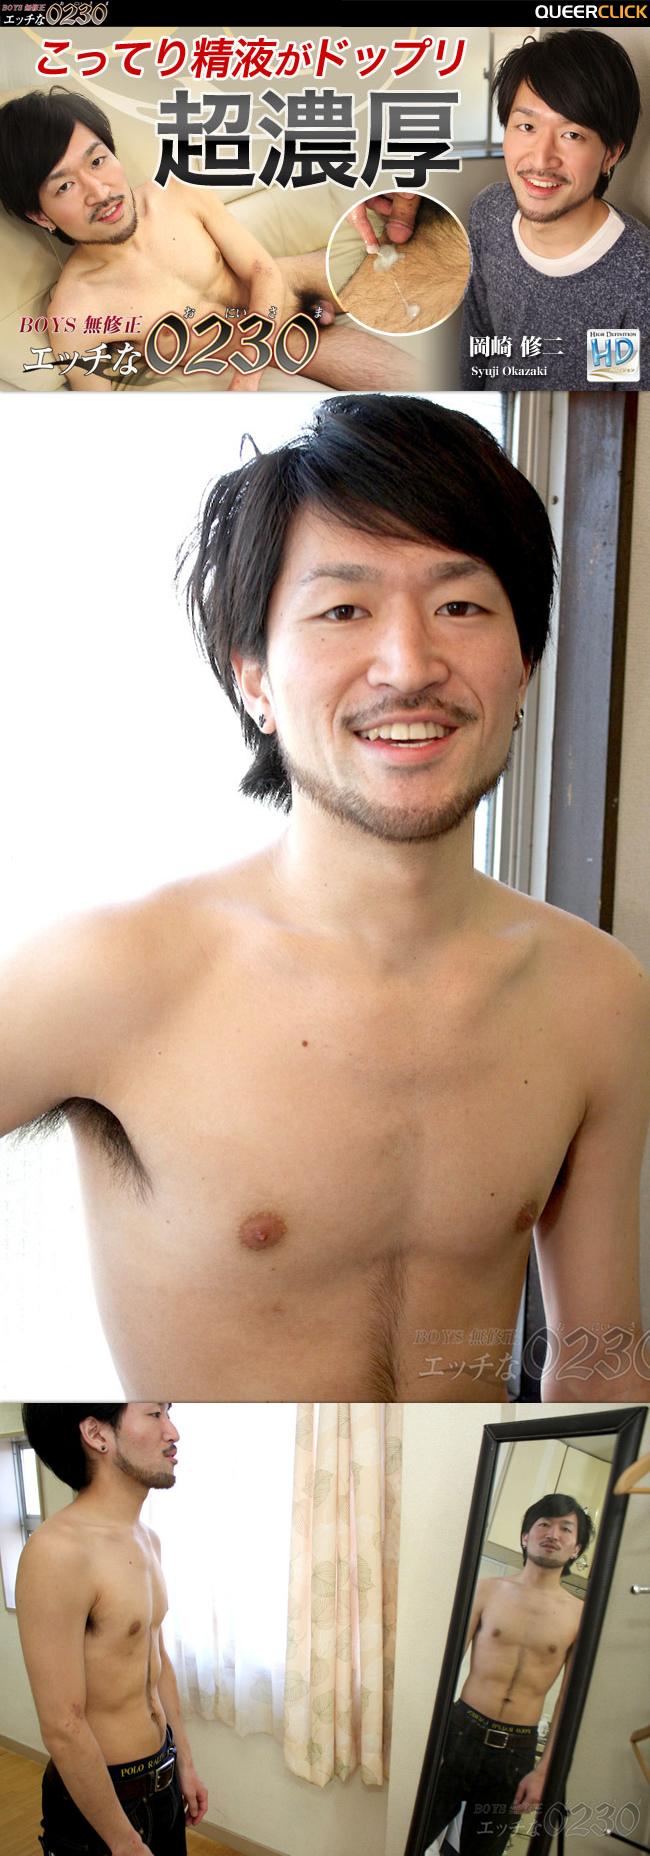 h0230-syuji-okazaki-m.jpg